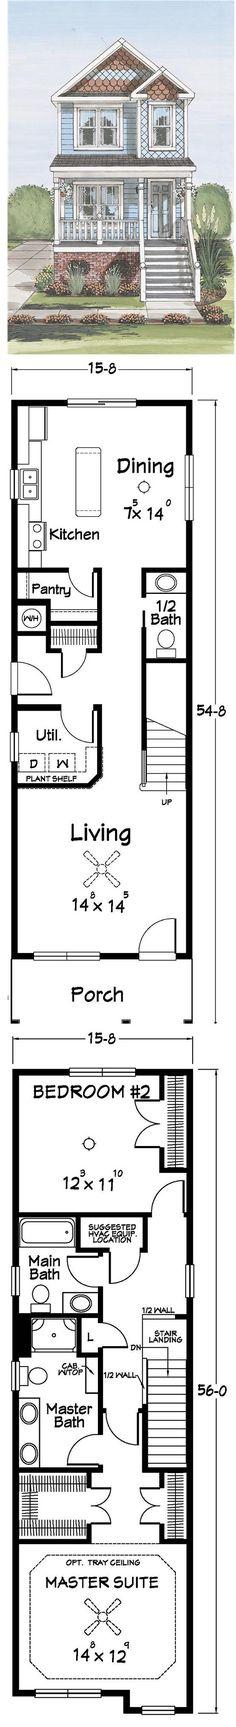 Narrow lot house floor plan via Building Works Australia